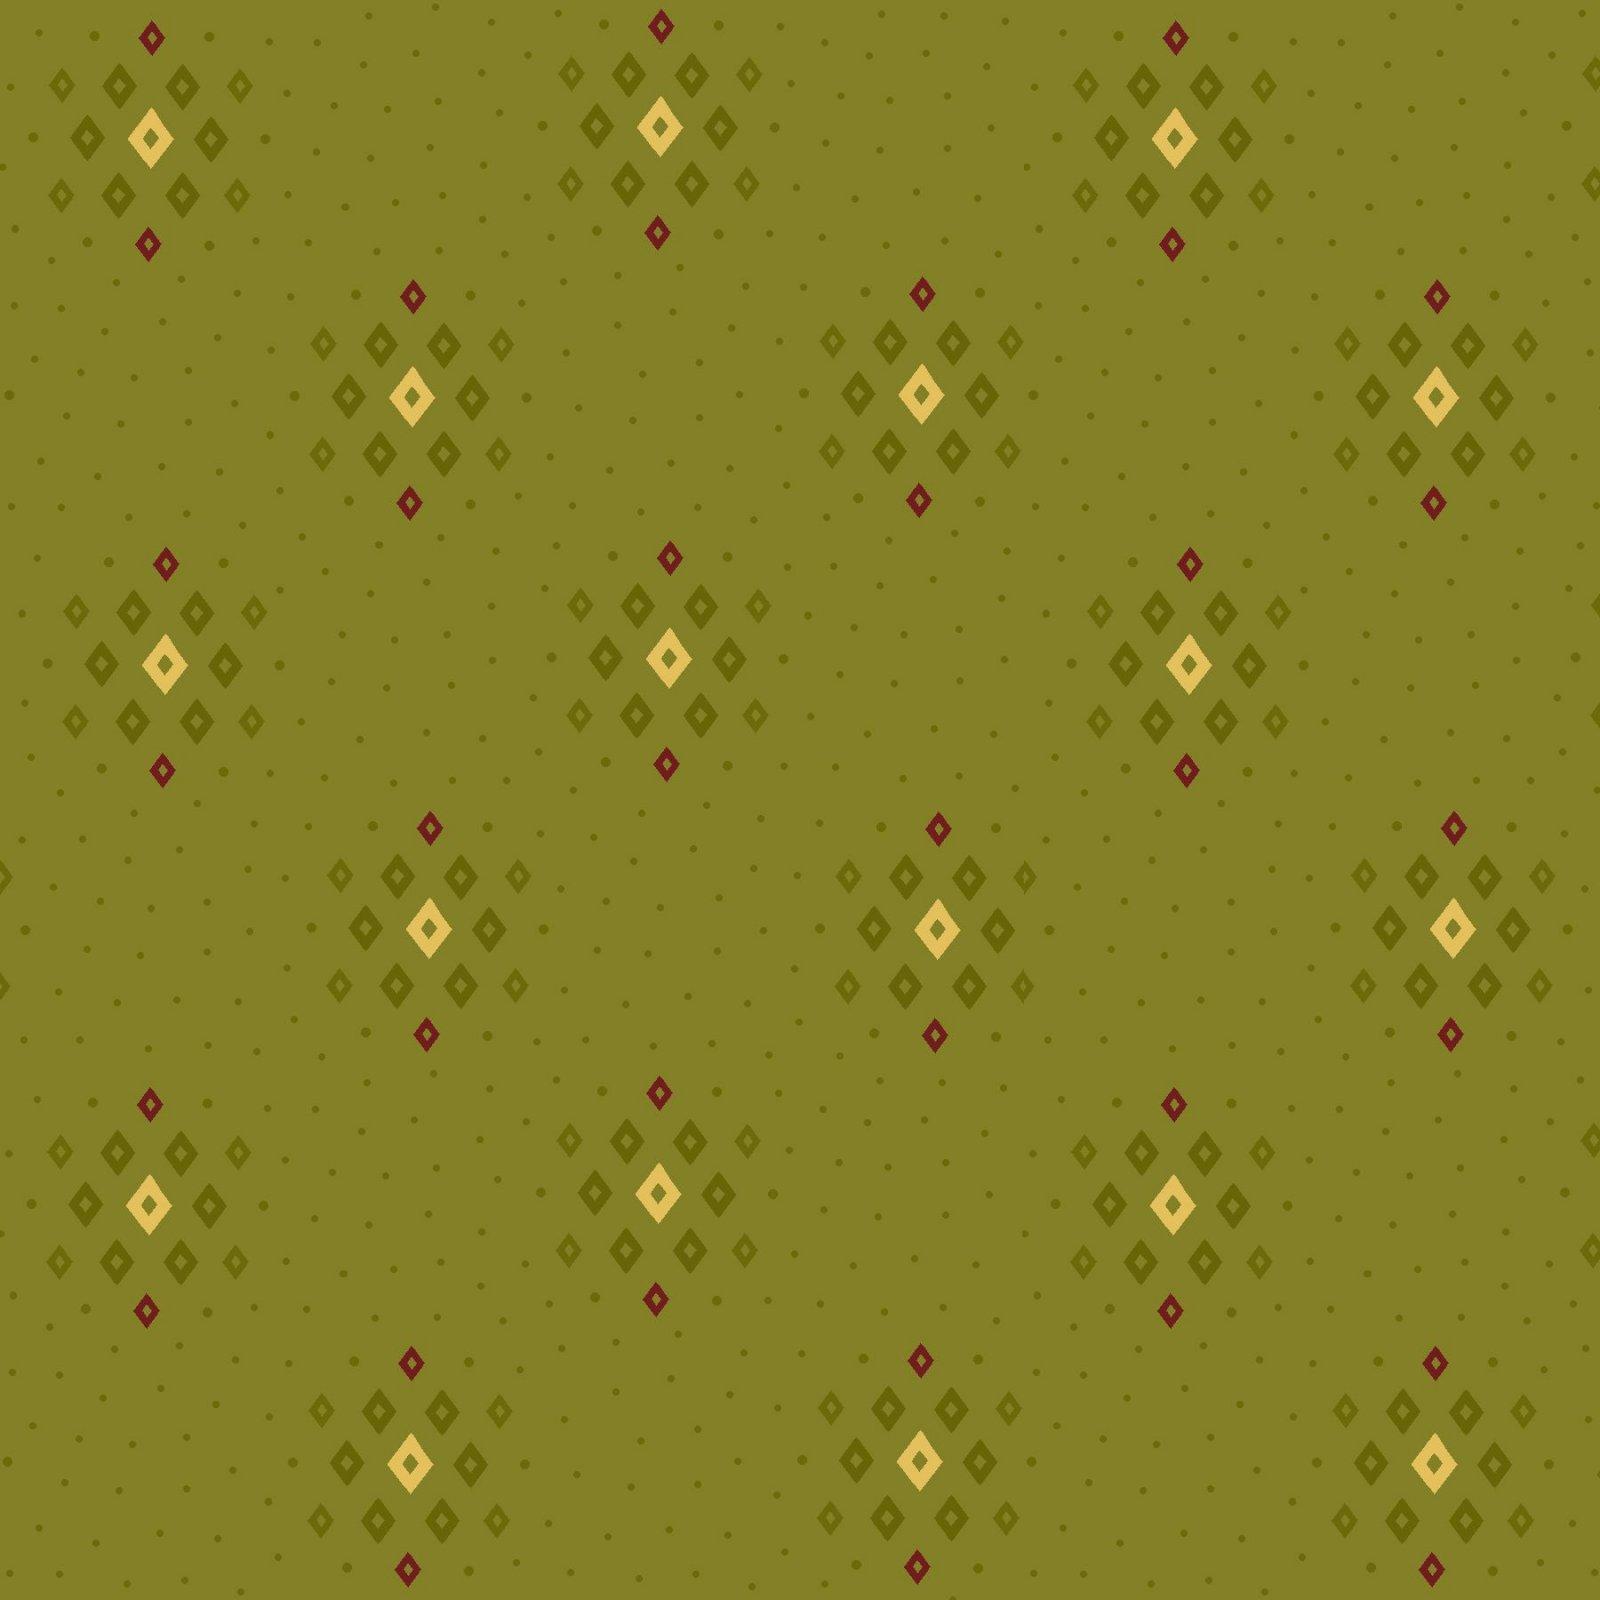 HG-Farmhouse Christmas 9677-66 Green - Tonal Diamond Clusters